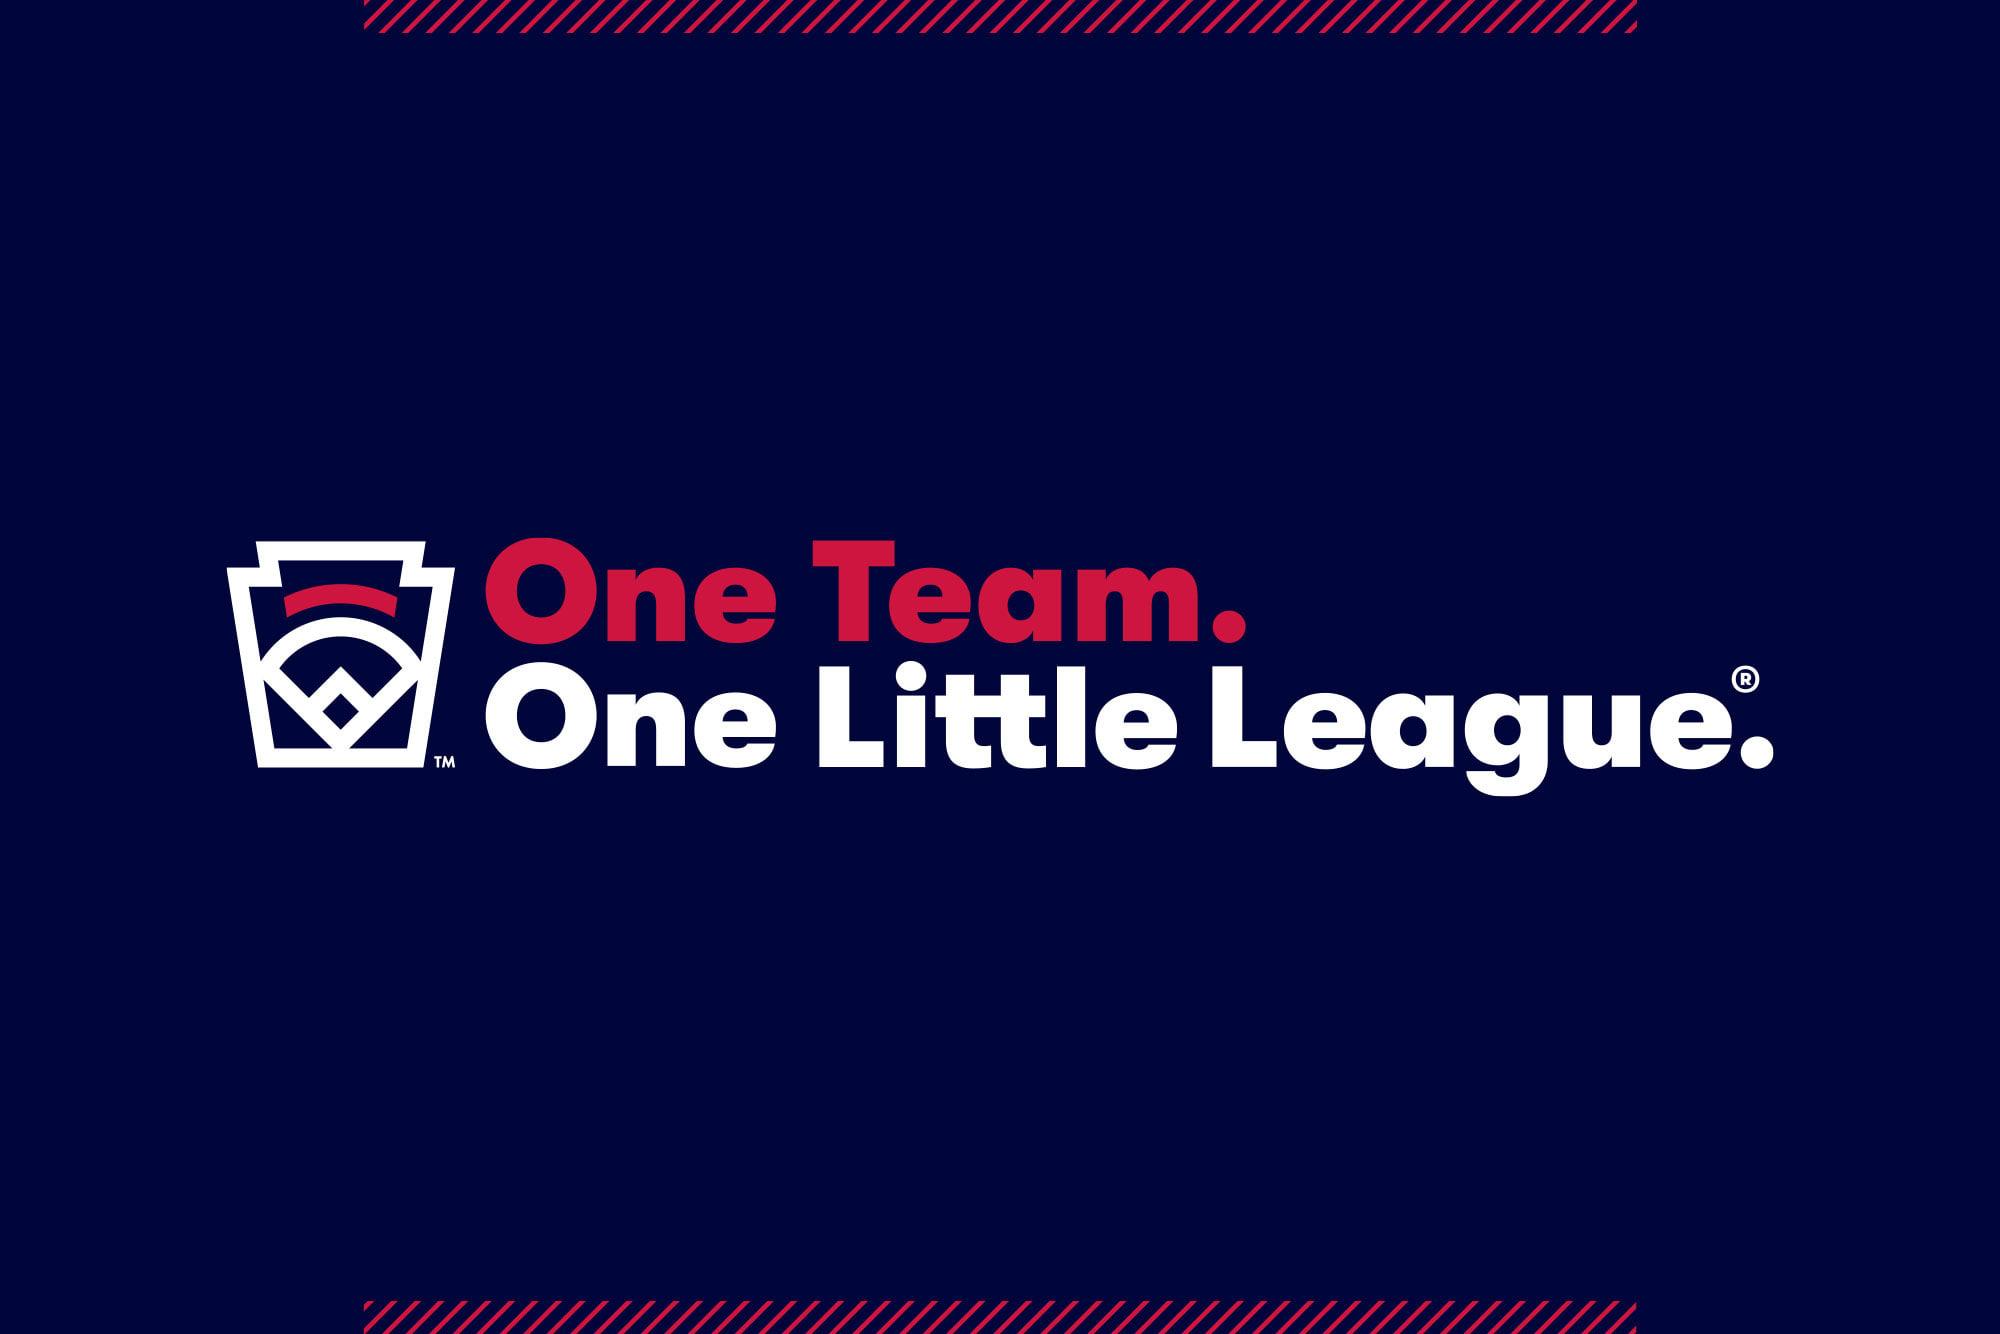 One Team. One Little League.